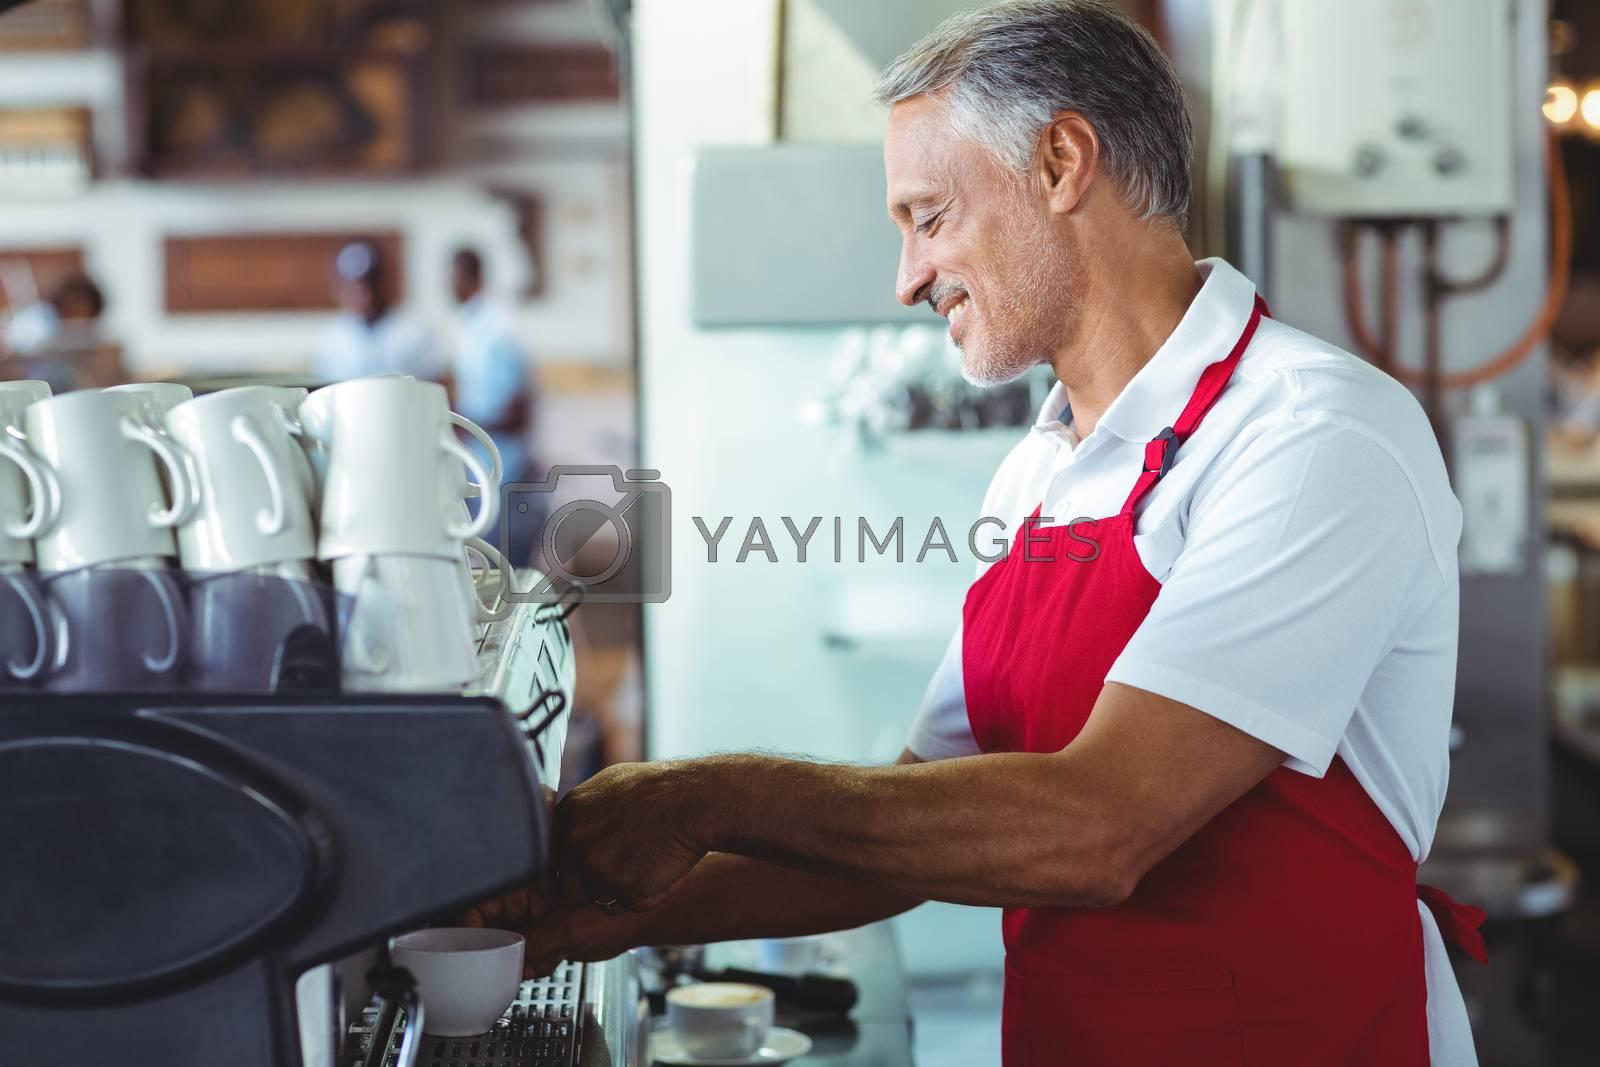 Royalty free image of Happy barista using the coffee machine by Wavebreakmedia